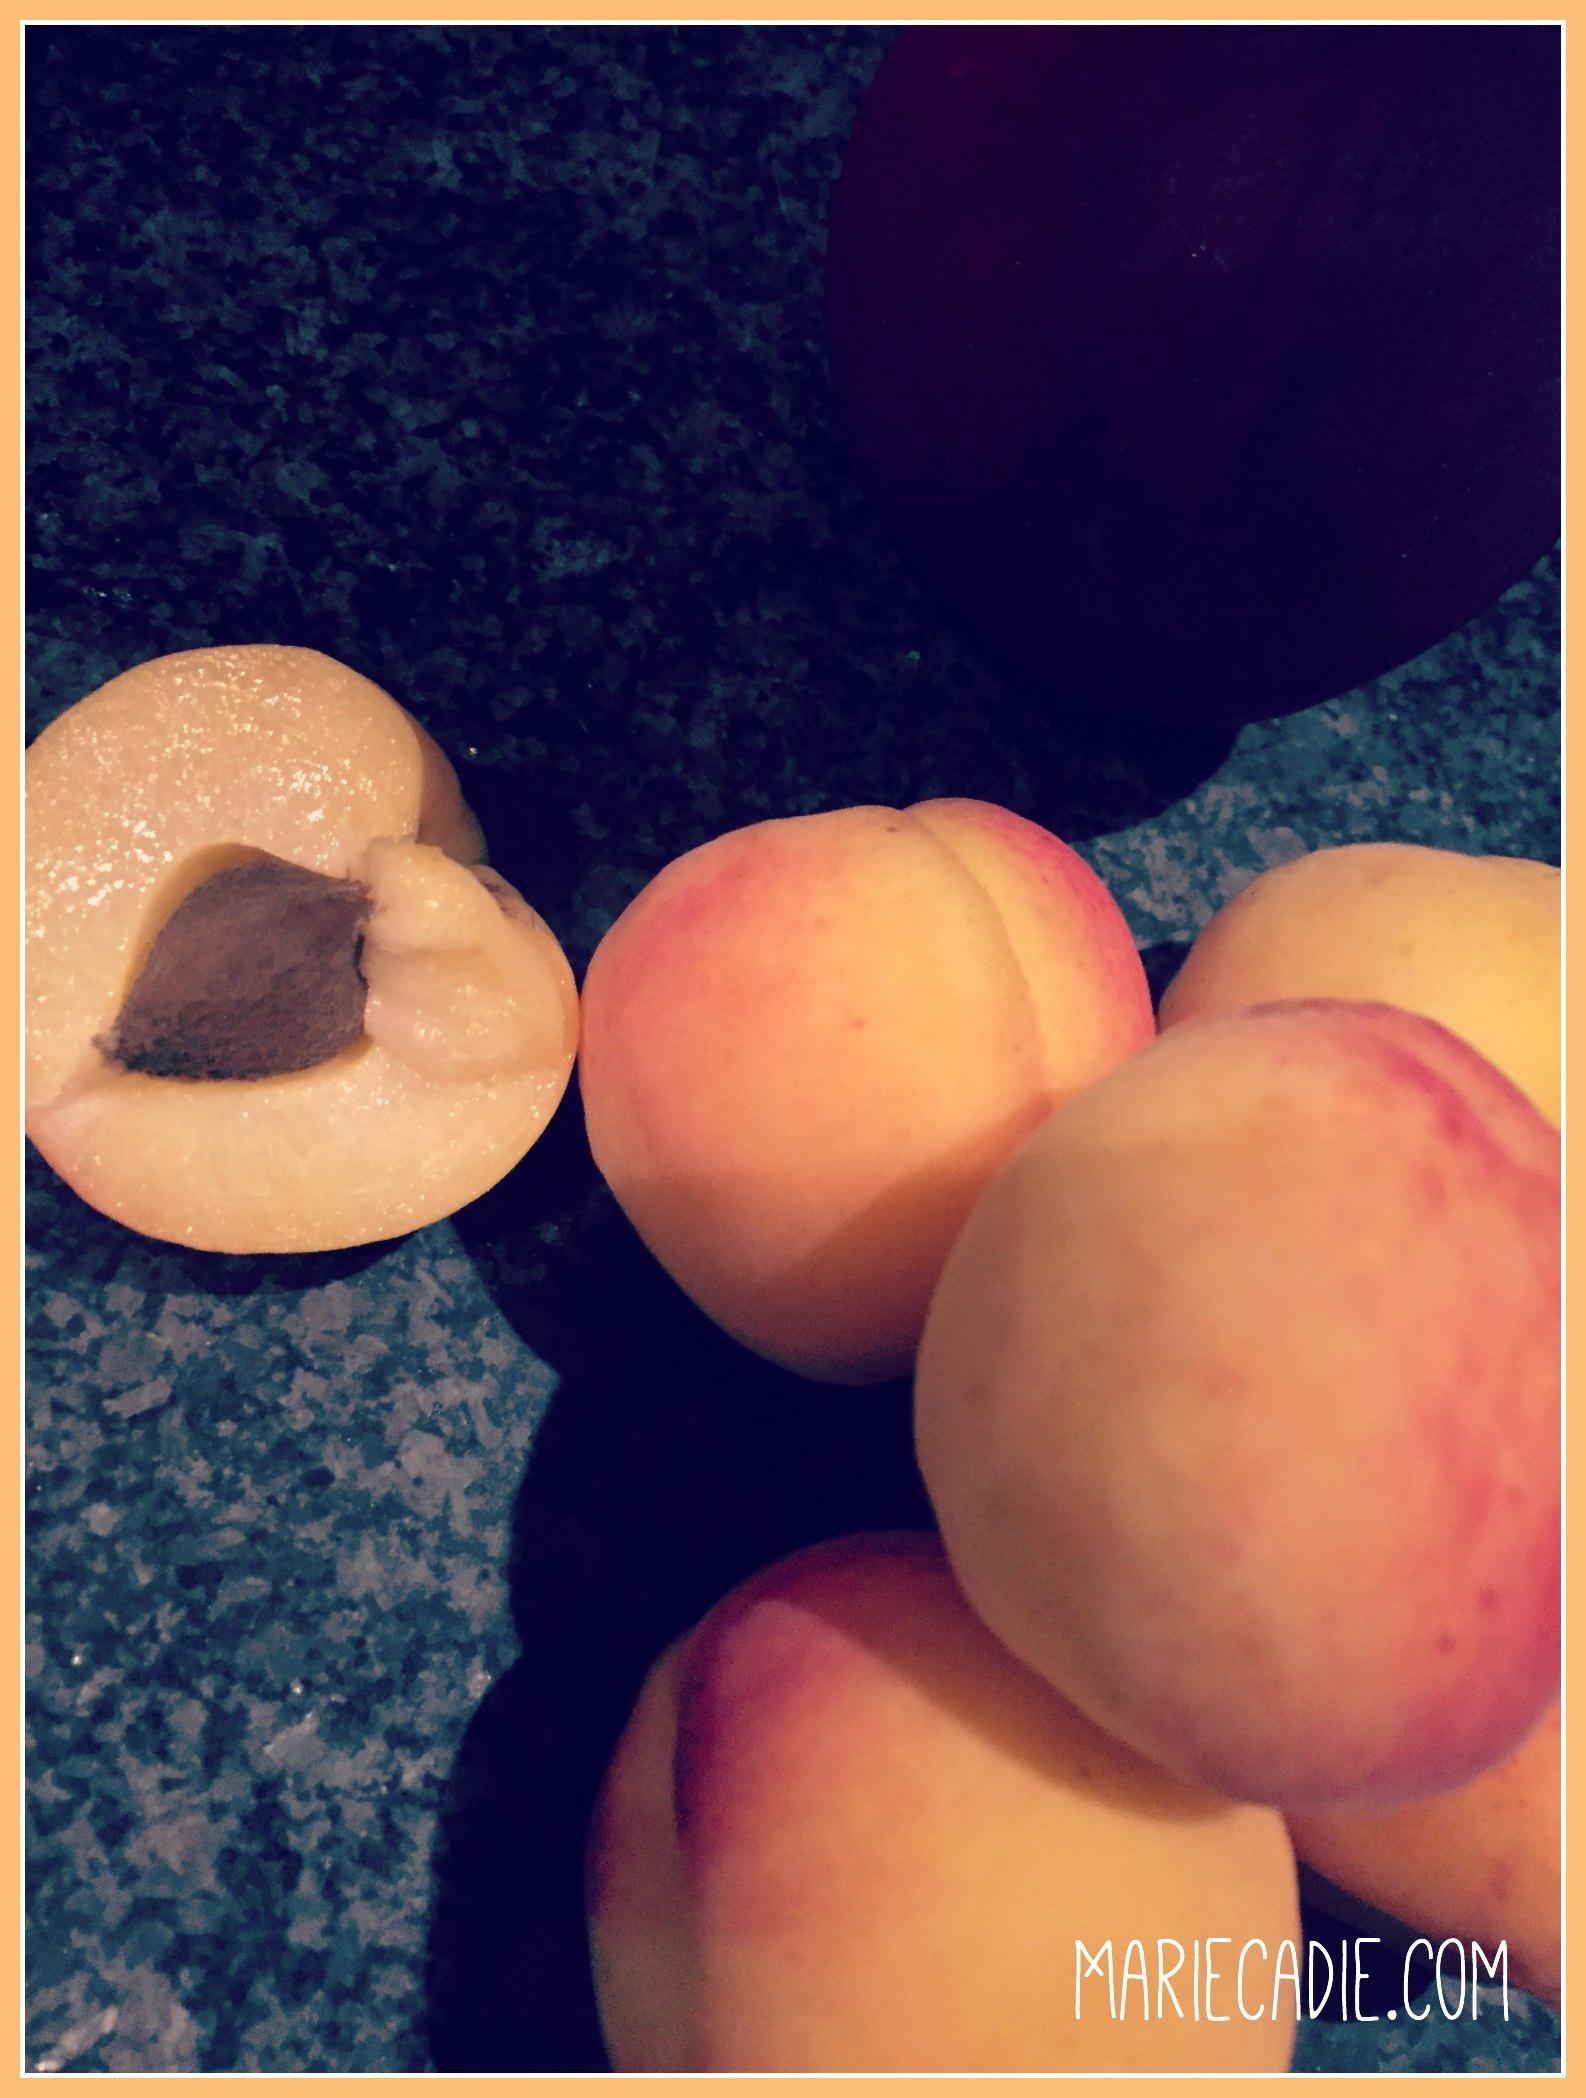 MarieCadie.com abrikoosjes